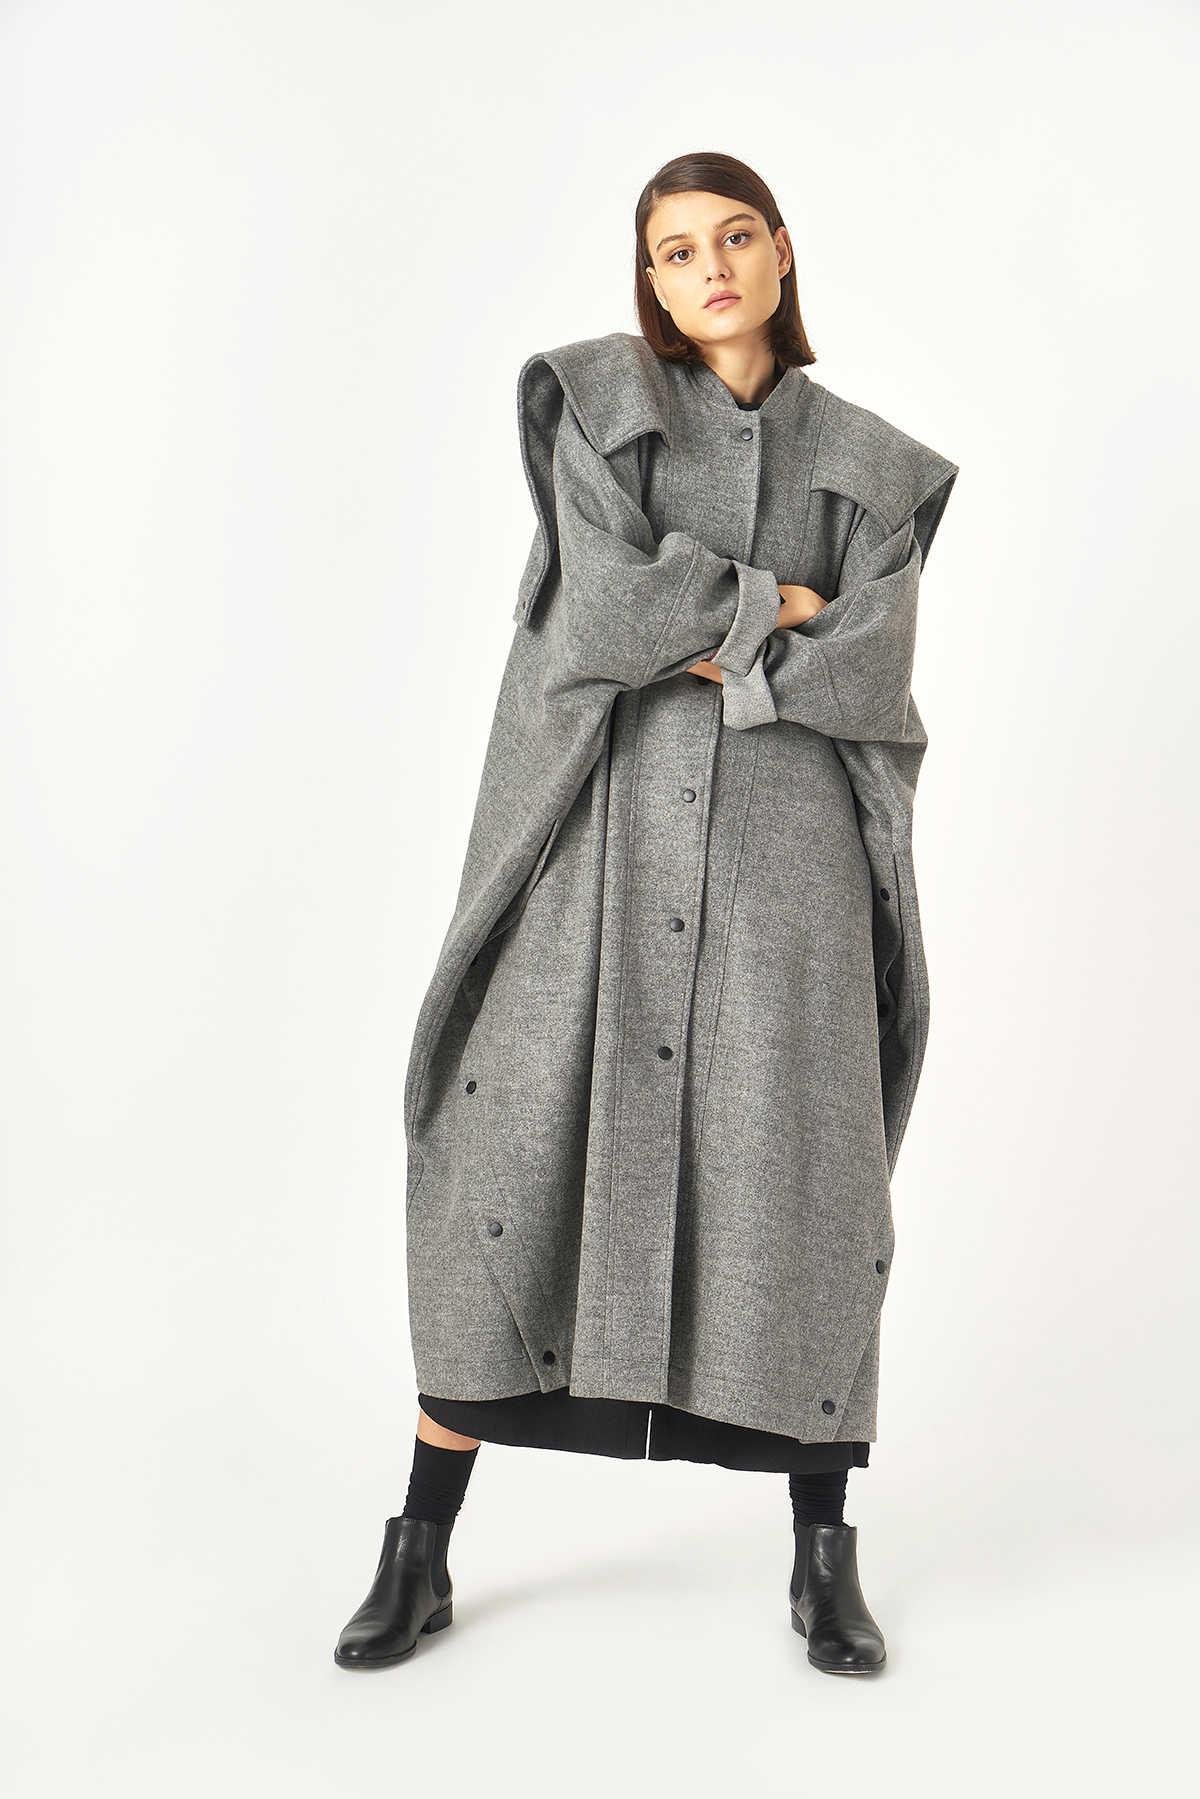 Kuaybe Gider - Kuaybe Gider Gri Kadın Palto 7099